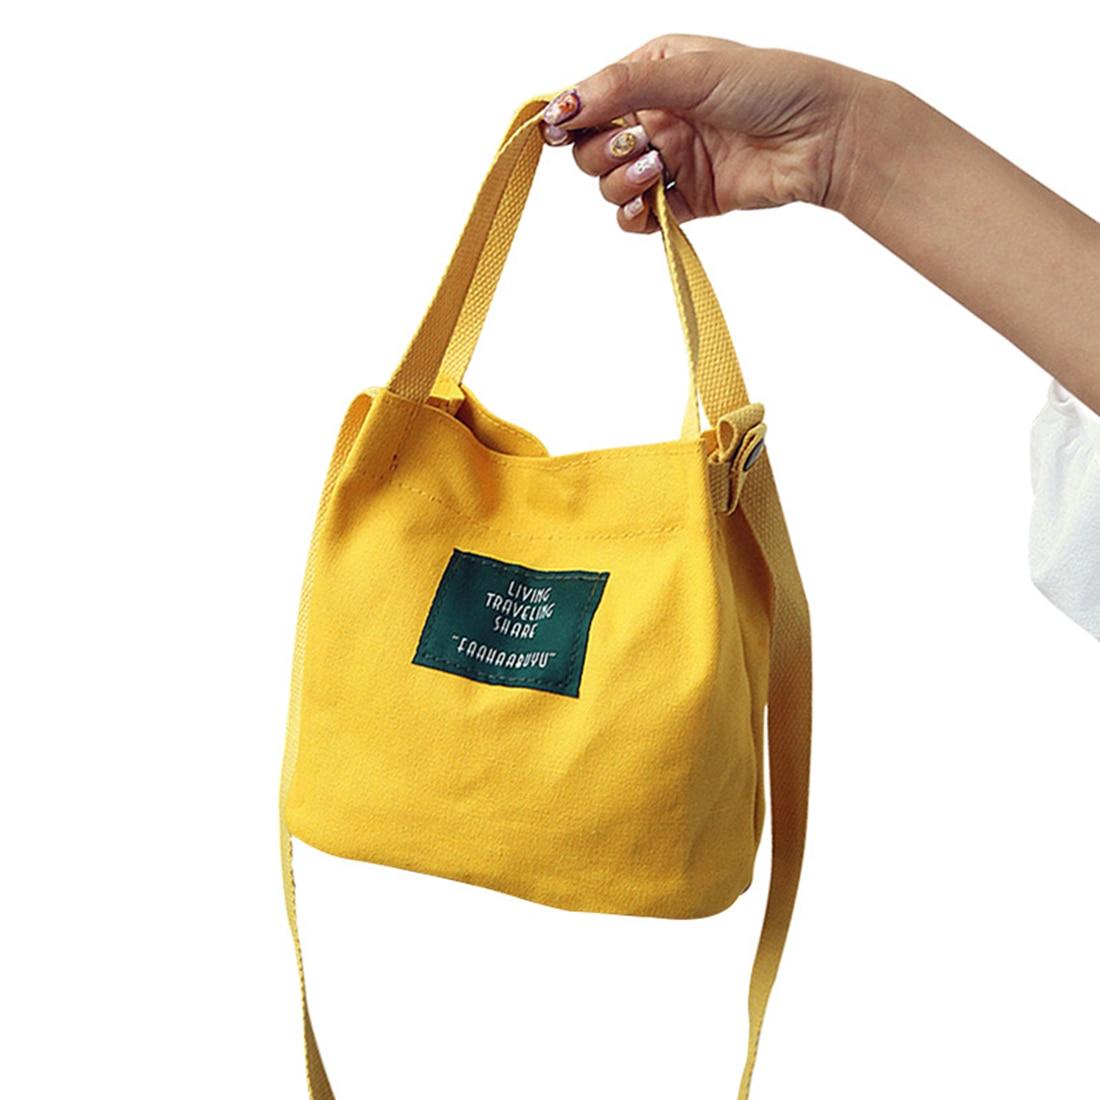 Crossbody Canvas Bag Woman Handbags Shoulder Bag Spring/Summer Canvas Shoulder Bag Student Messenger Corssbody Tote for Teens 2016 summer mix color cloth art shoulder woman bag leisure packages exclusively for export national bag